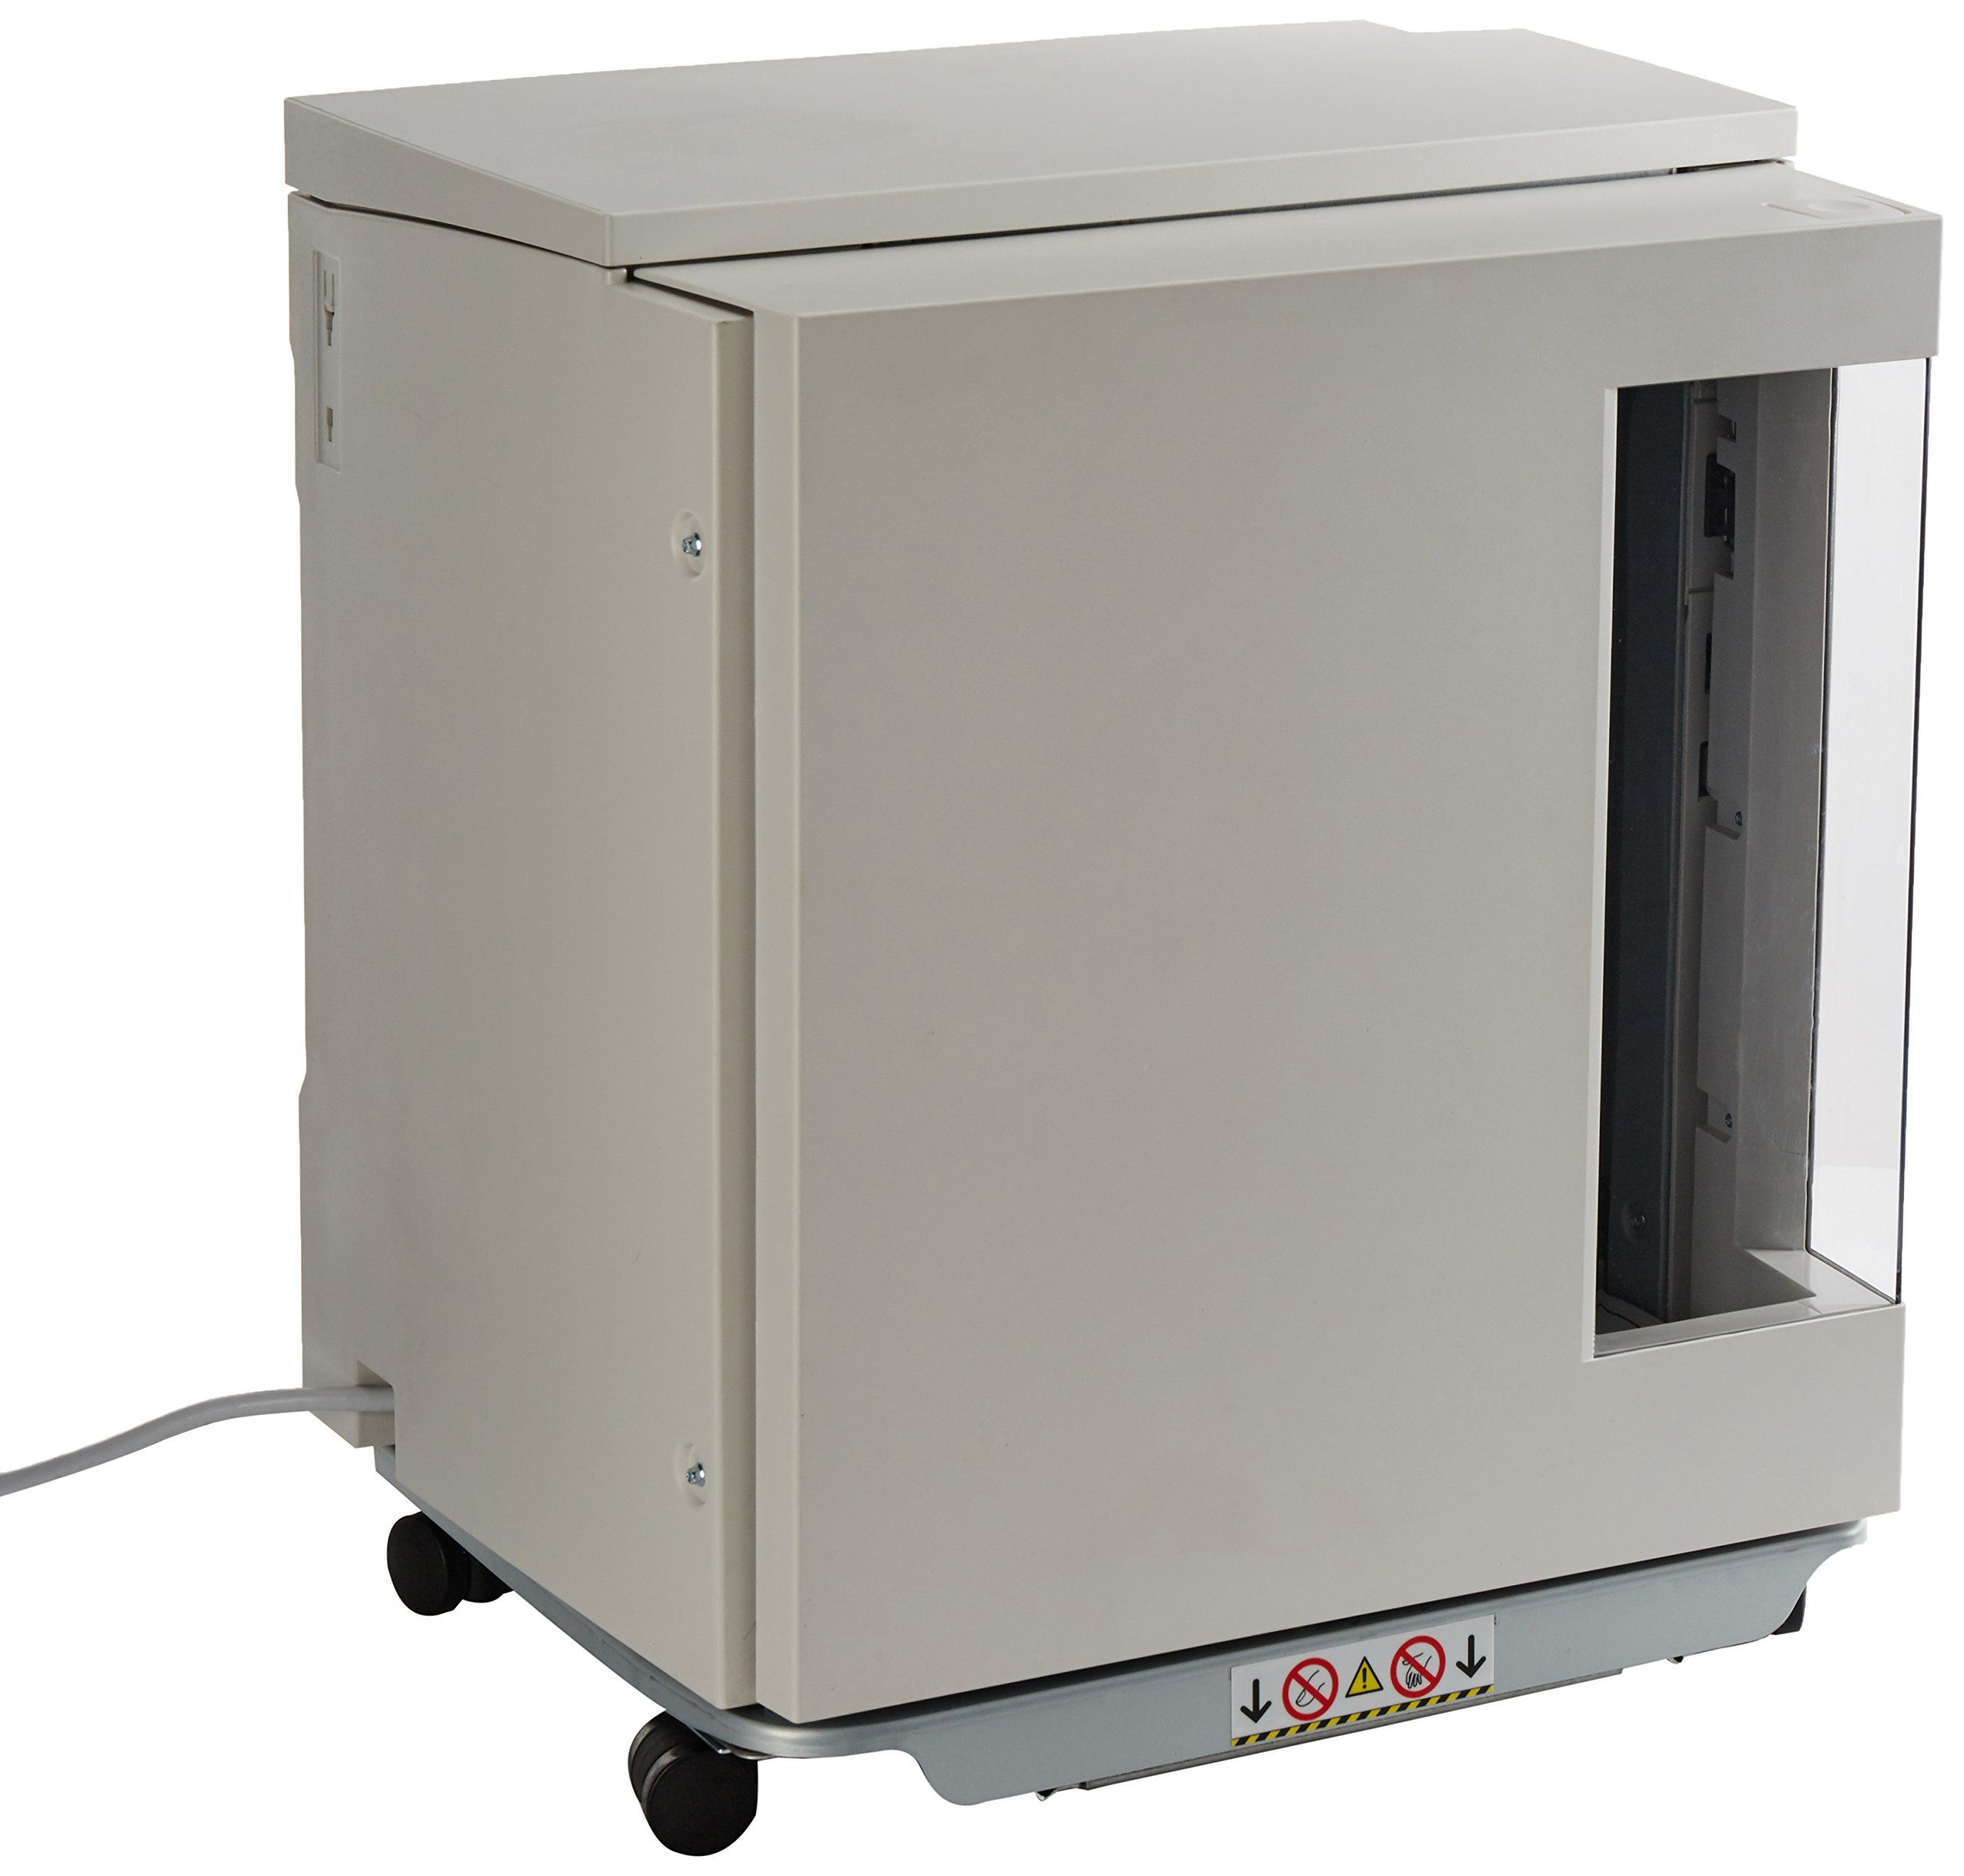 Xerox 4000 sheet high capacity feeder 097s04415 xerox workcentre 5845 5855 4 000 sheet high capacity feeder expand workflow options for your xerox